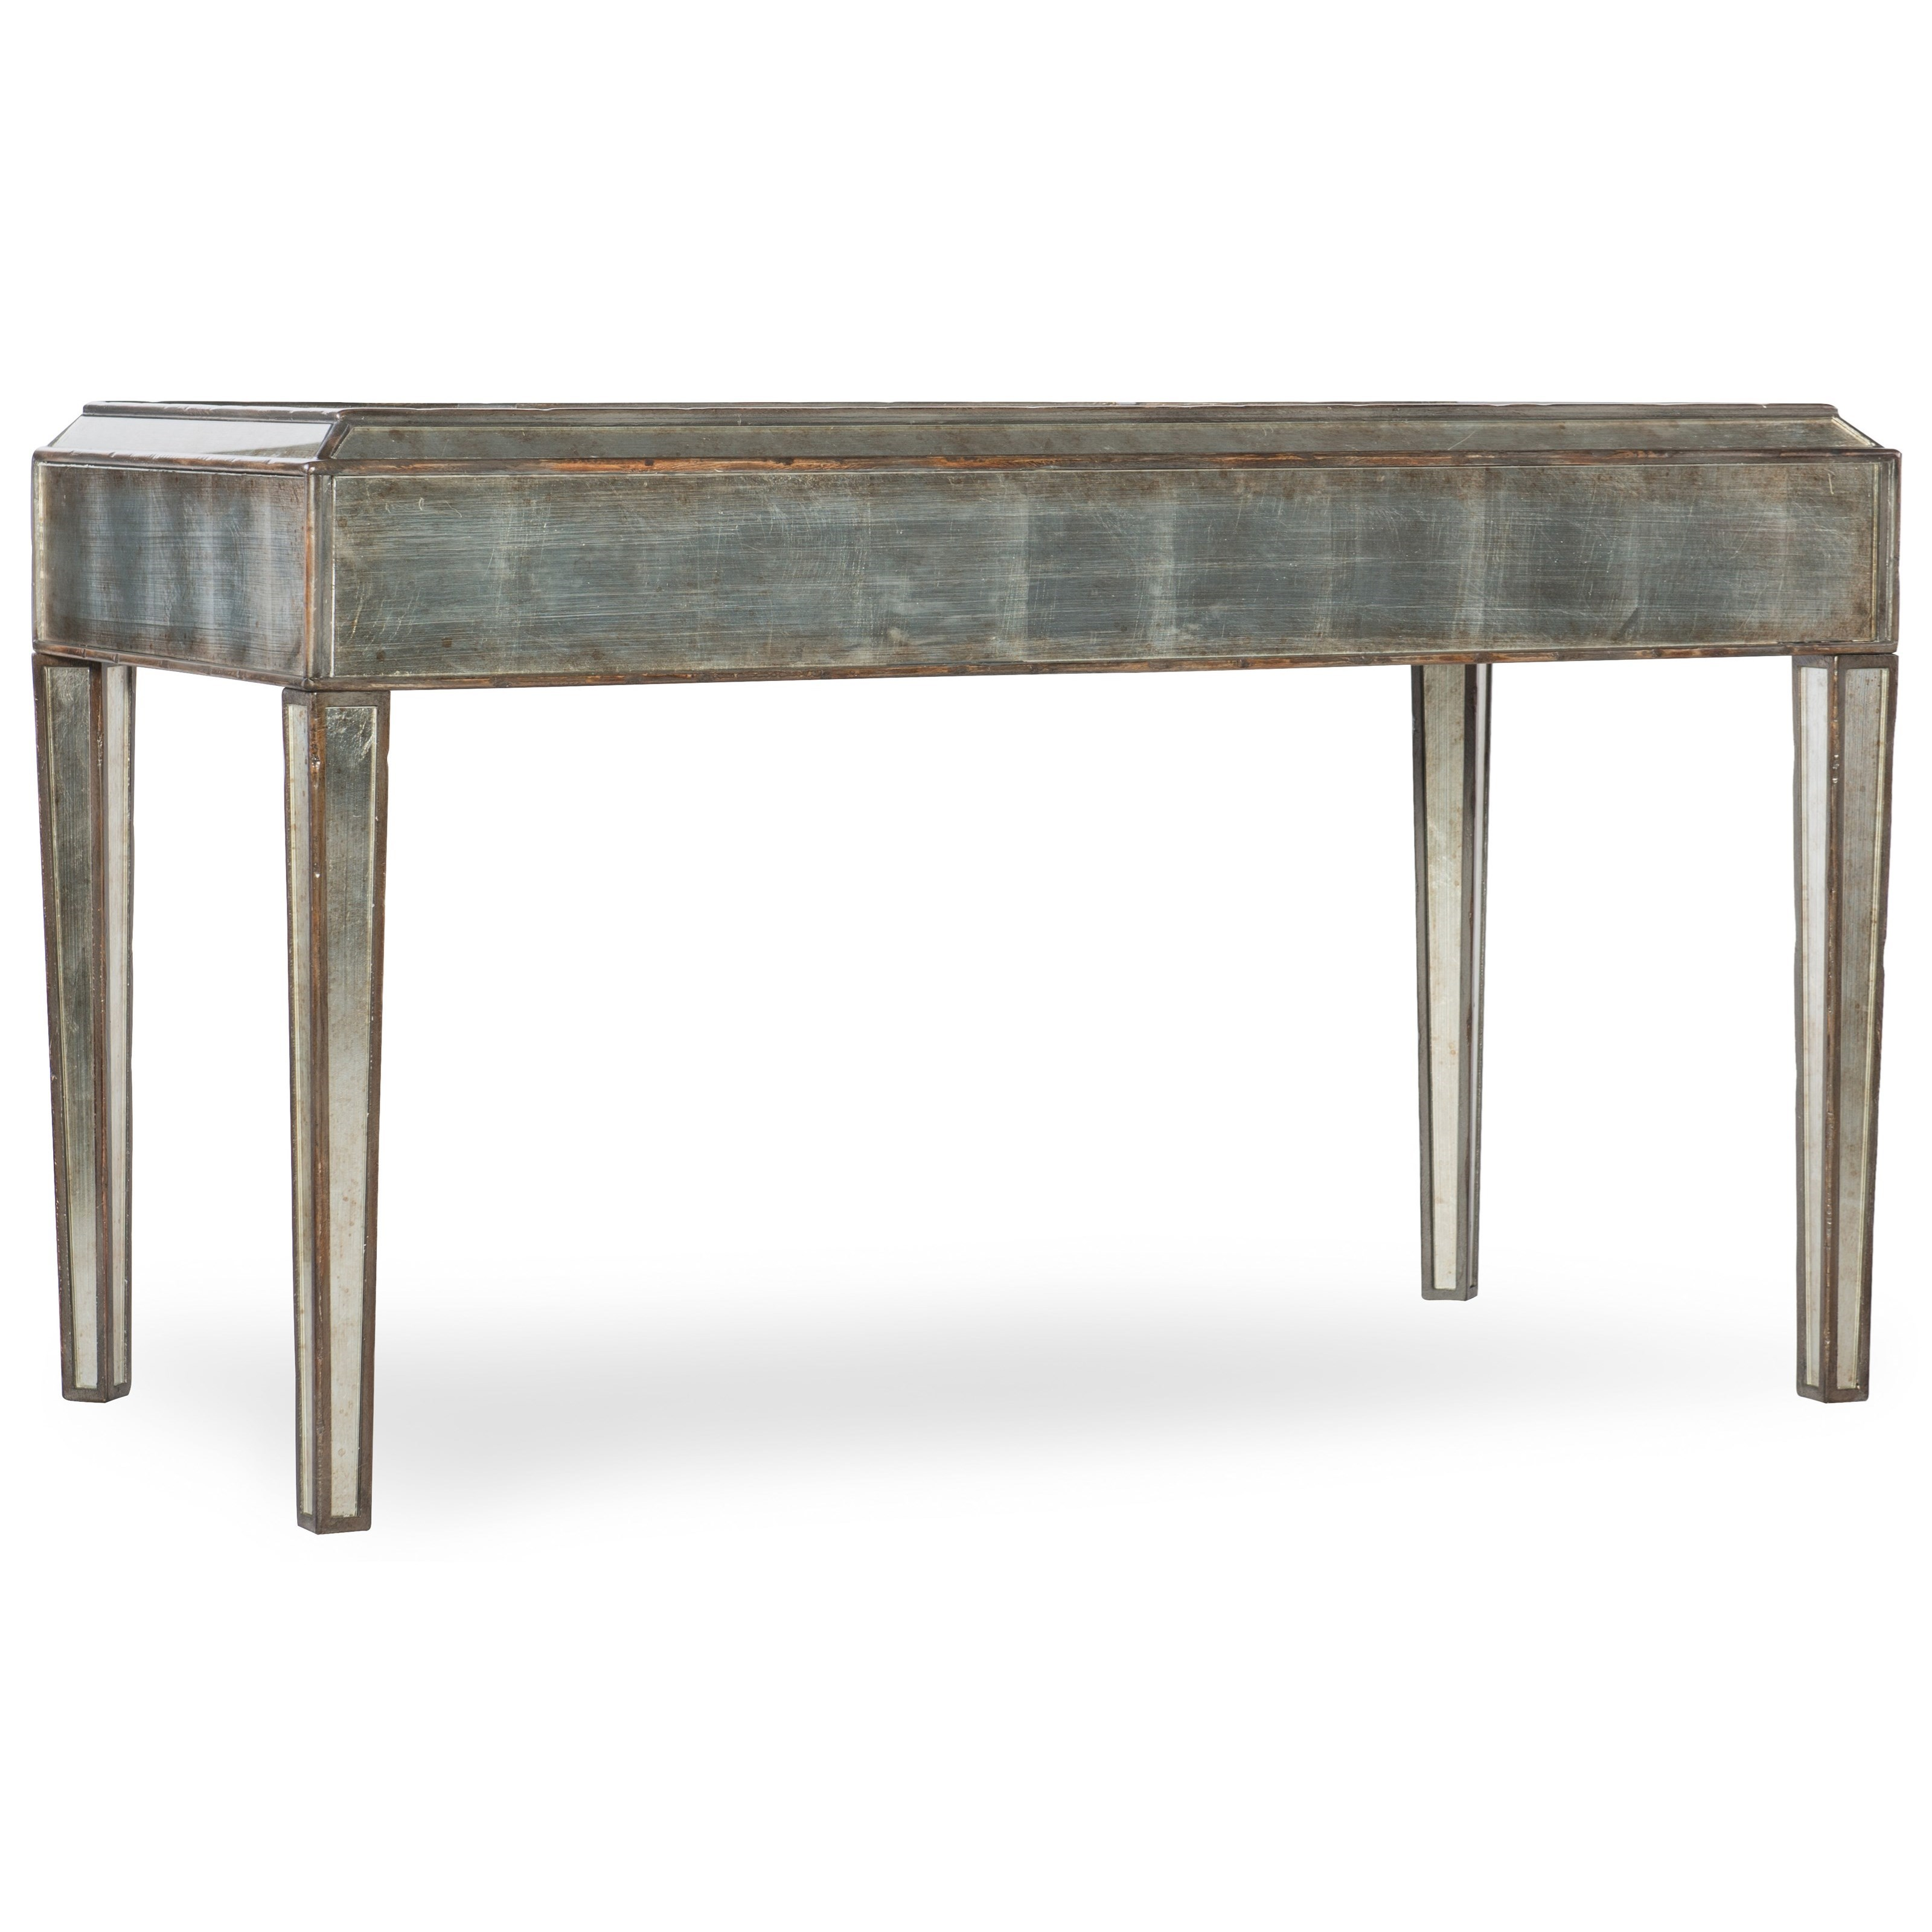 Hooker Furniture Arabella Mirrored Writing Desk - Dunk ...